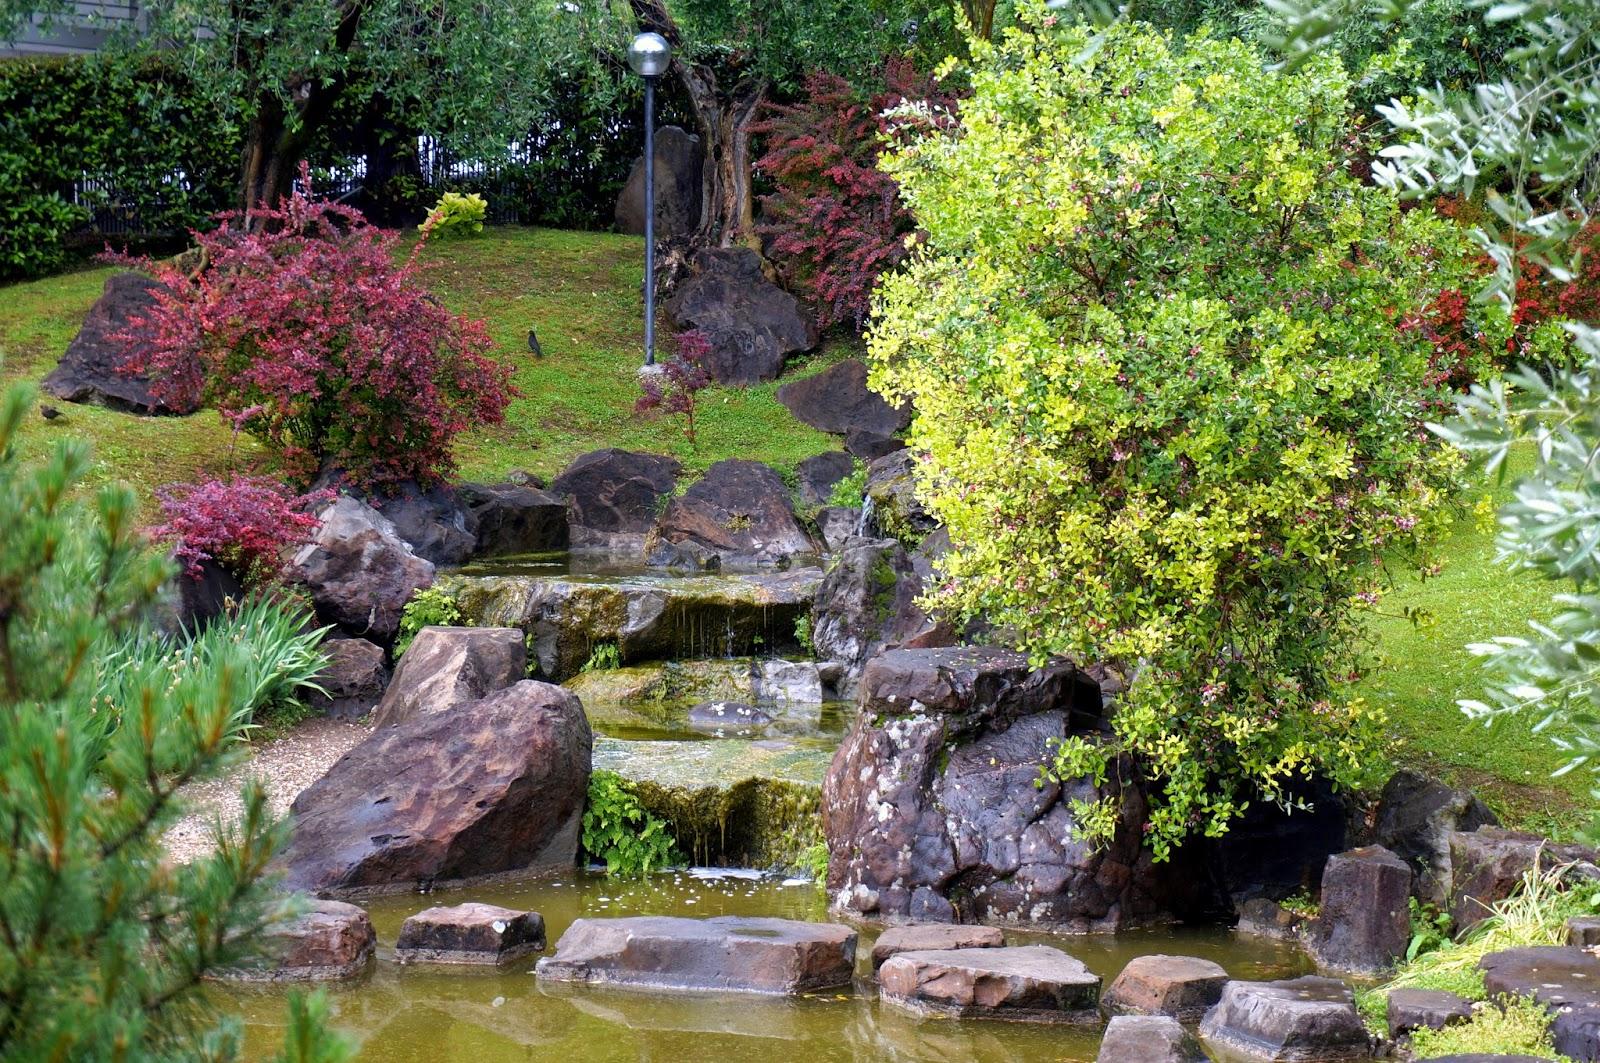 Giardino giapponese roma come arrivare